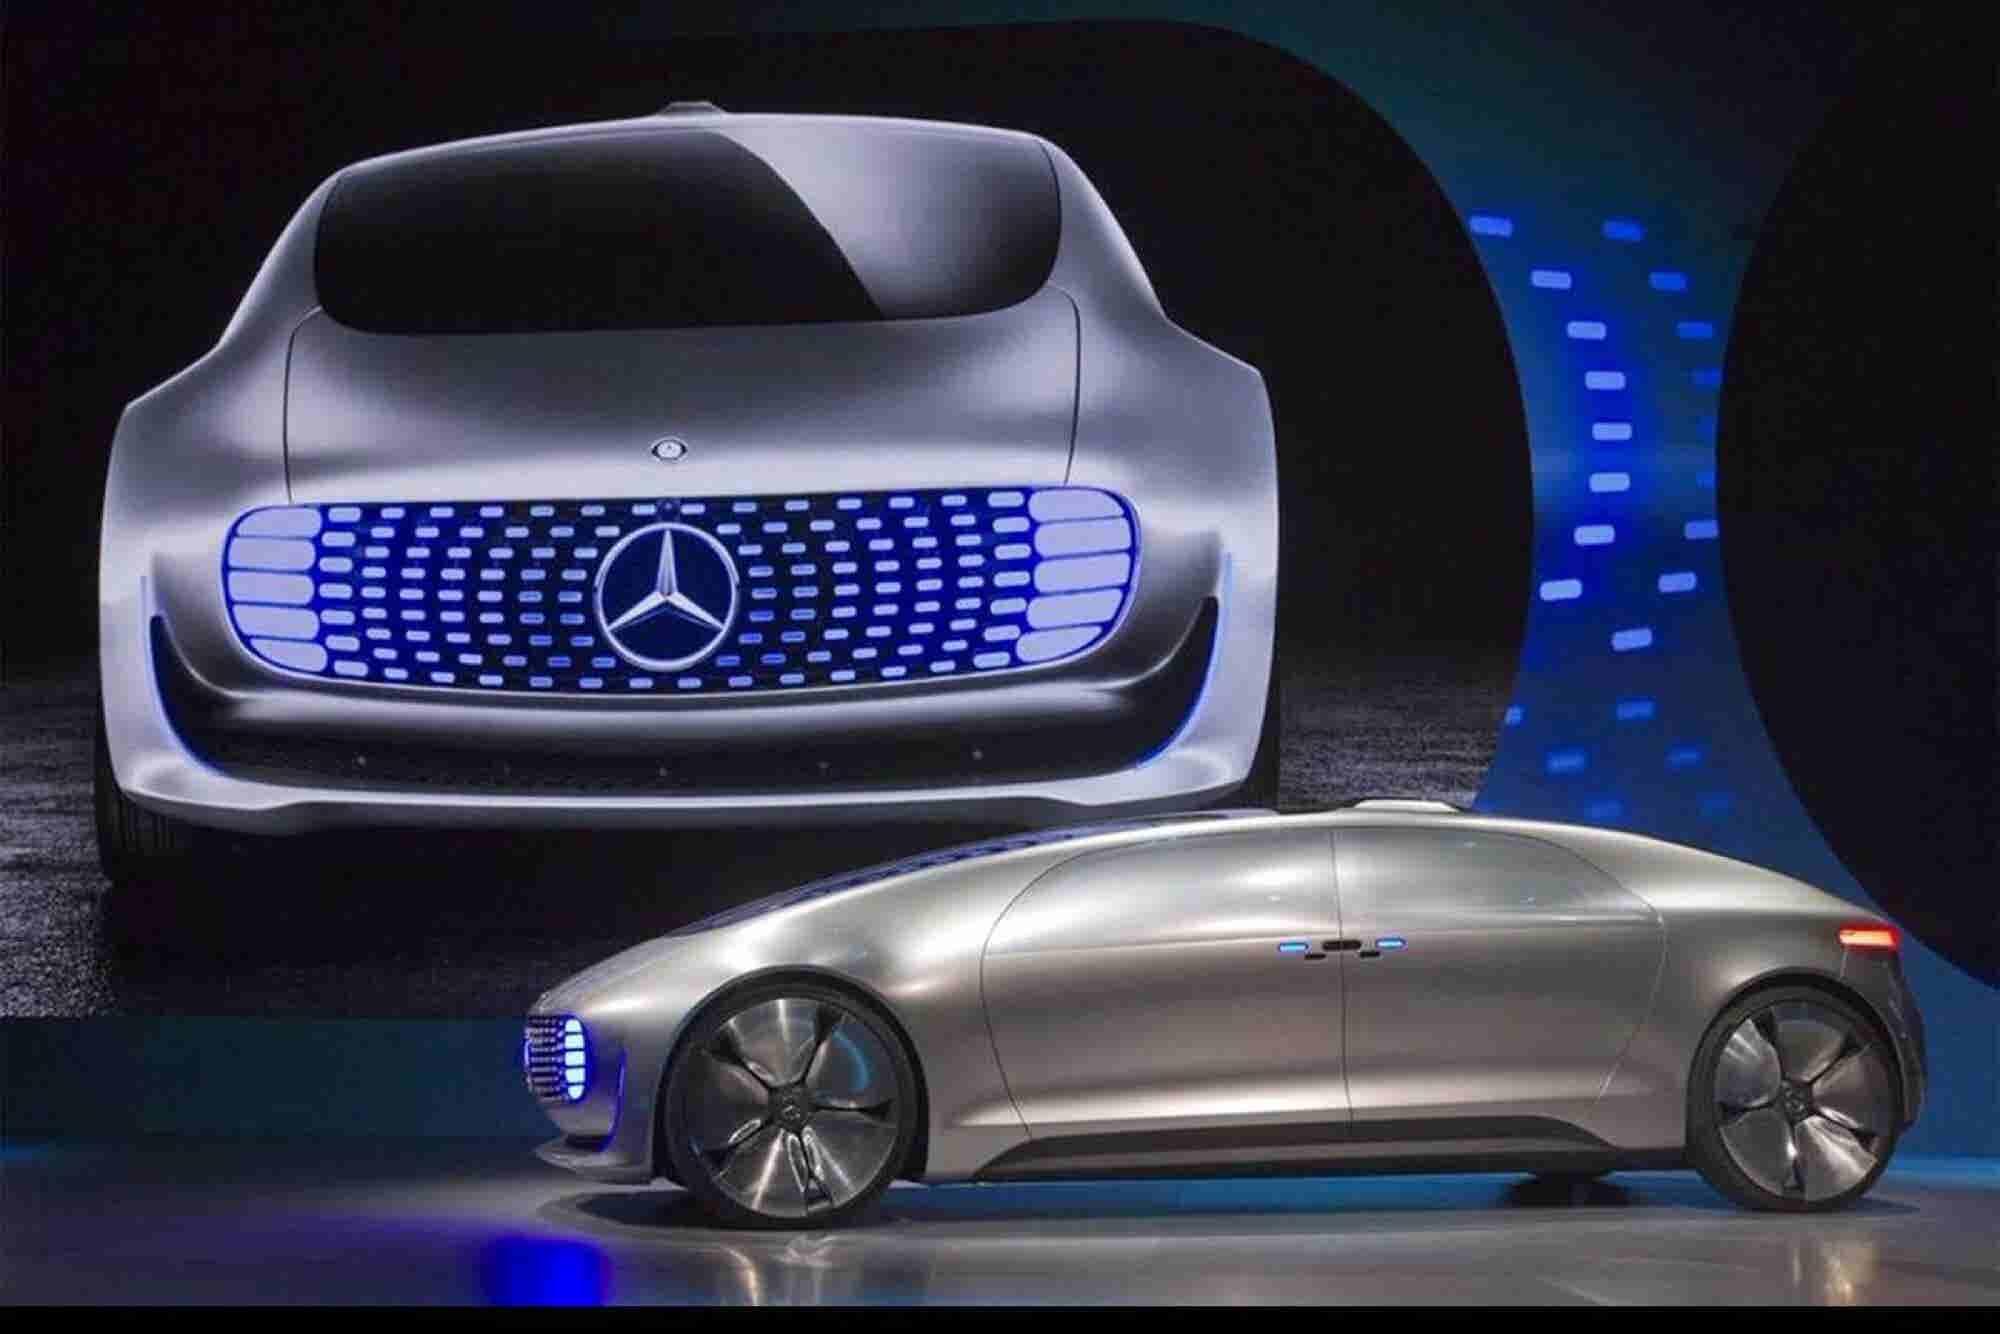 Mercedes' Self-Driving Car Says Hello to San Francisco